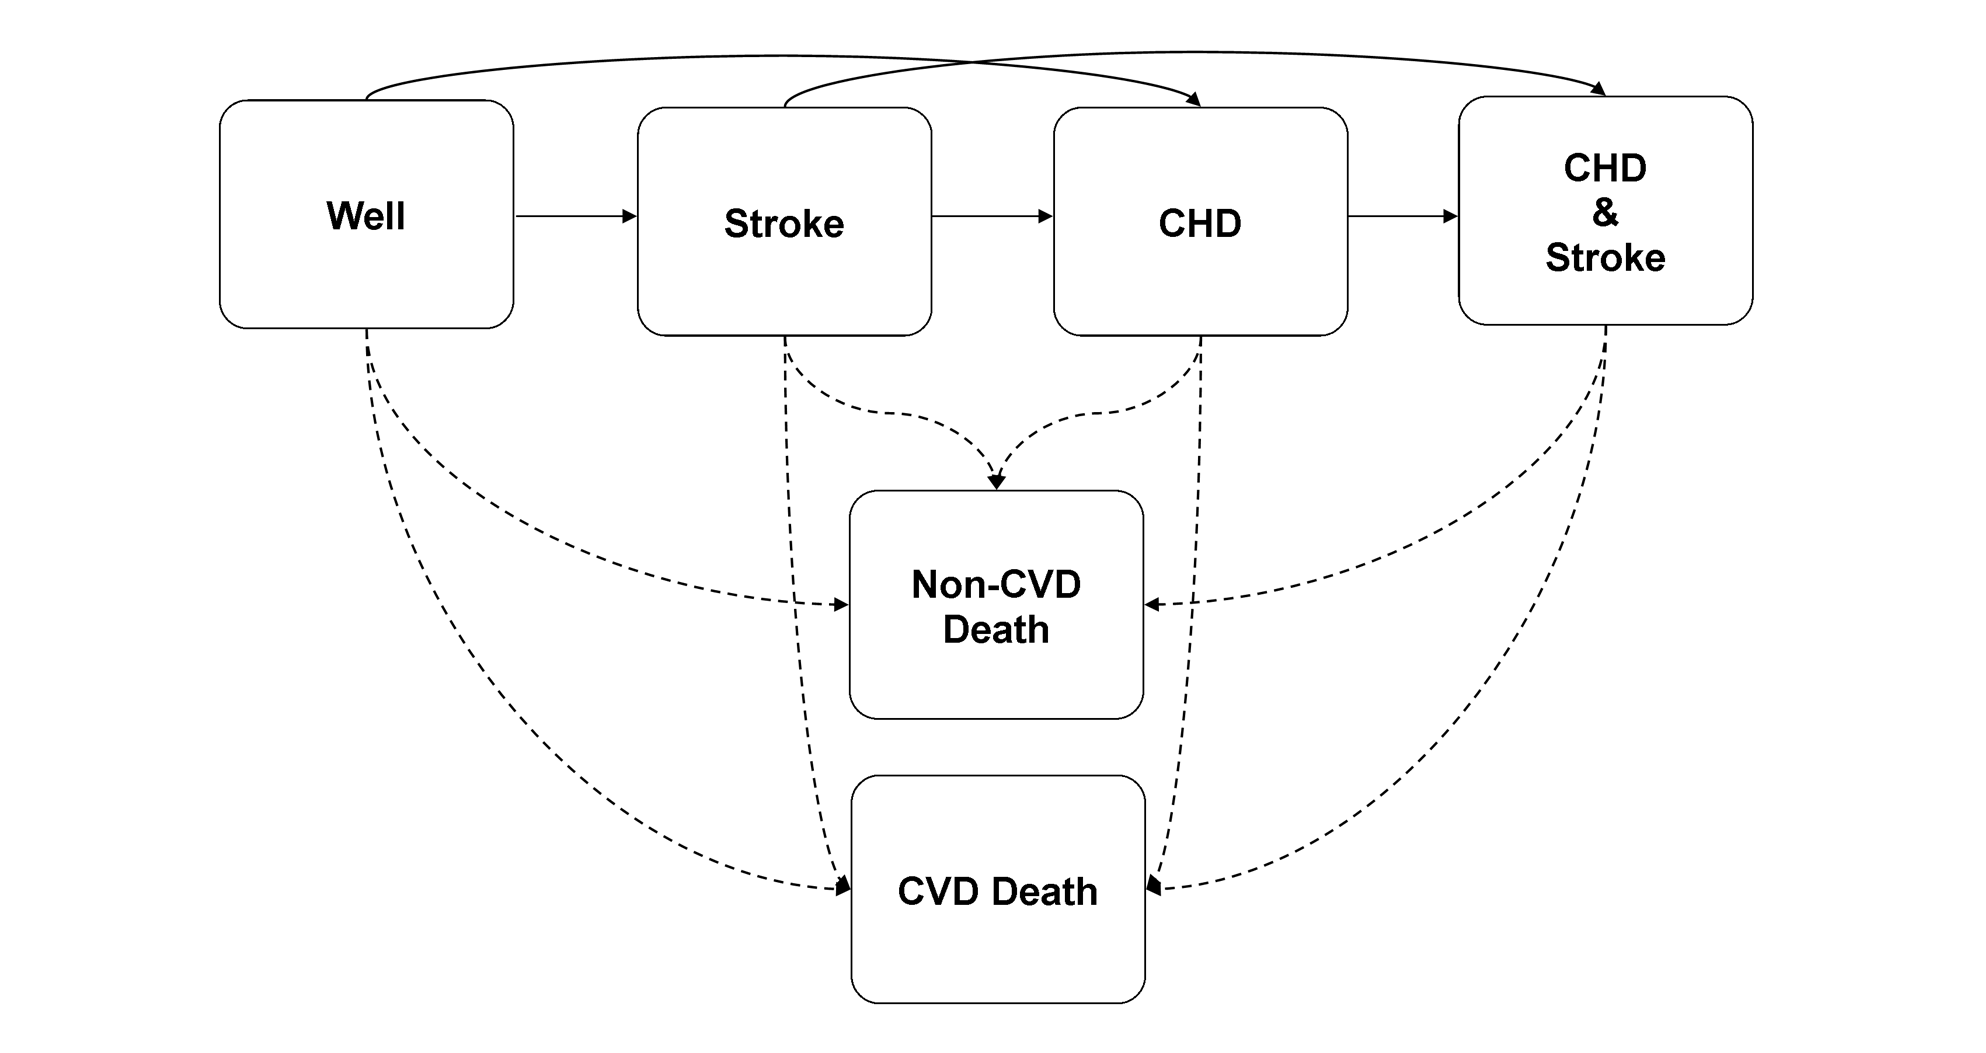 Schematic representation of the RISC model.